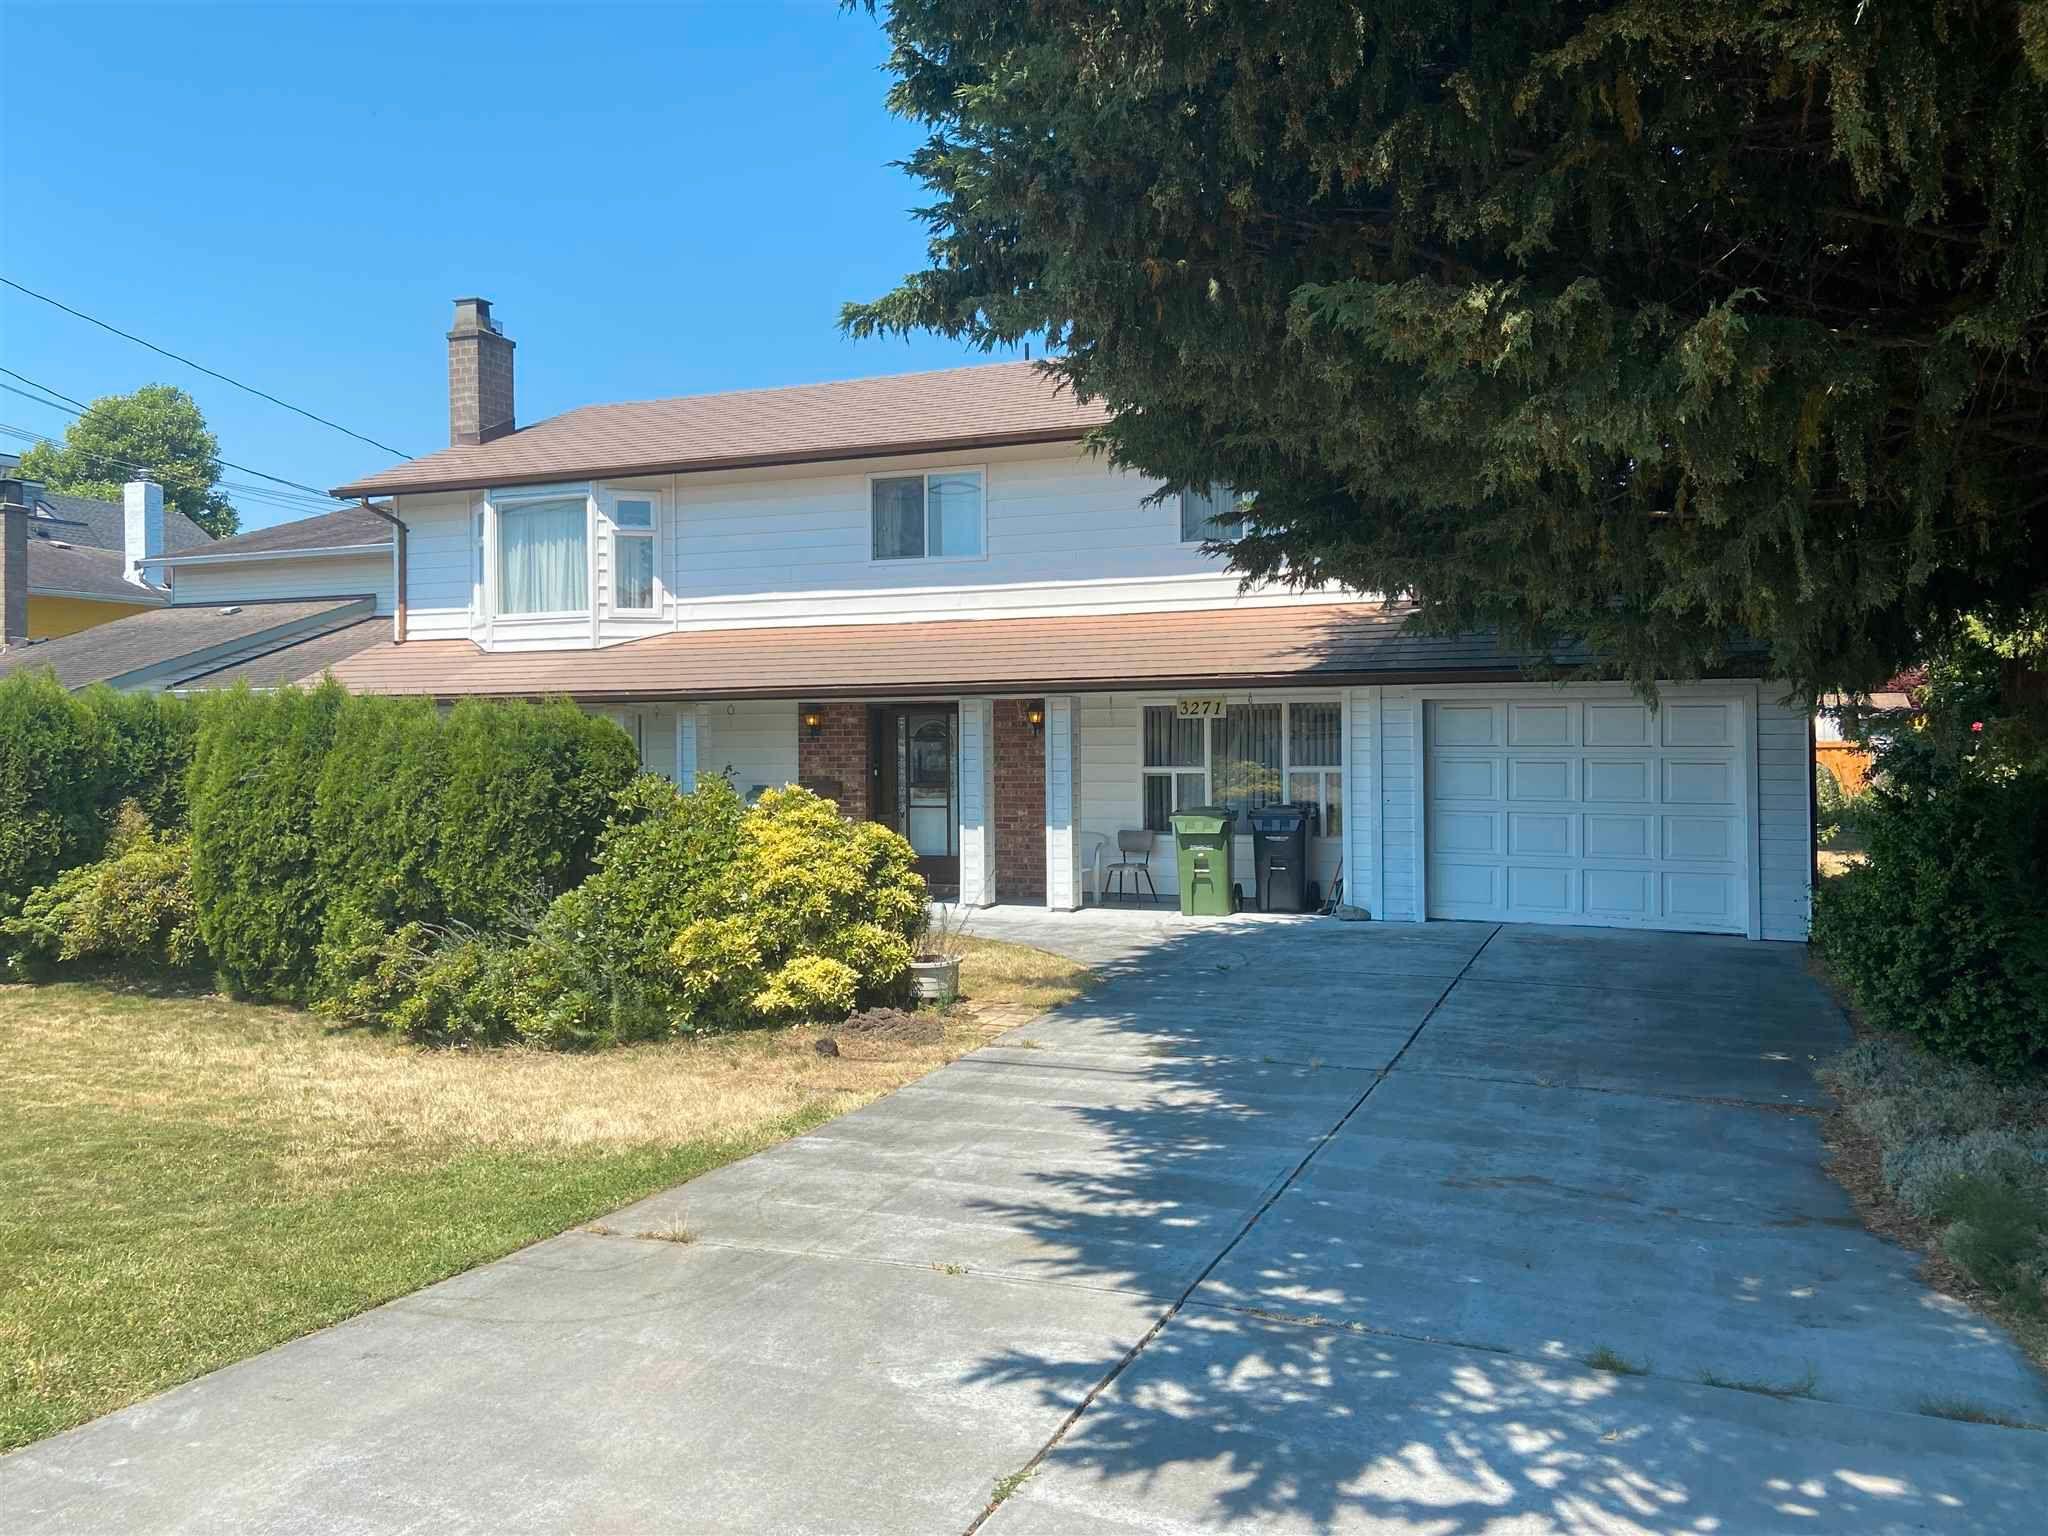 Main Photo: 3271 BROADWAY Street in Richmond: Steveston Village House for sale : MLS®# R2597646